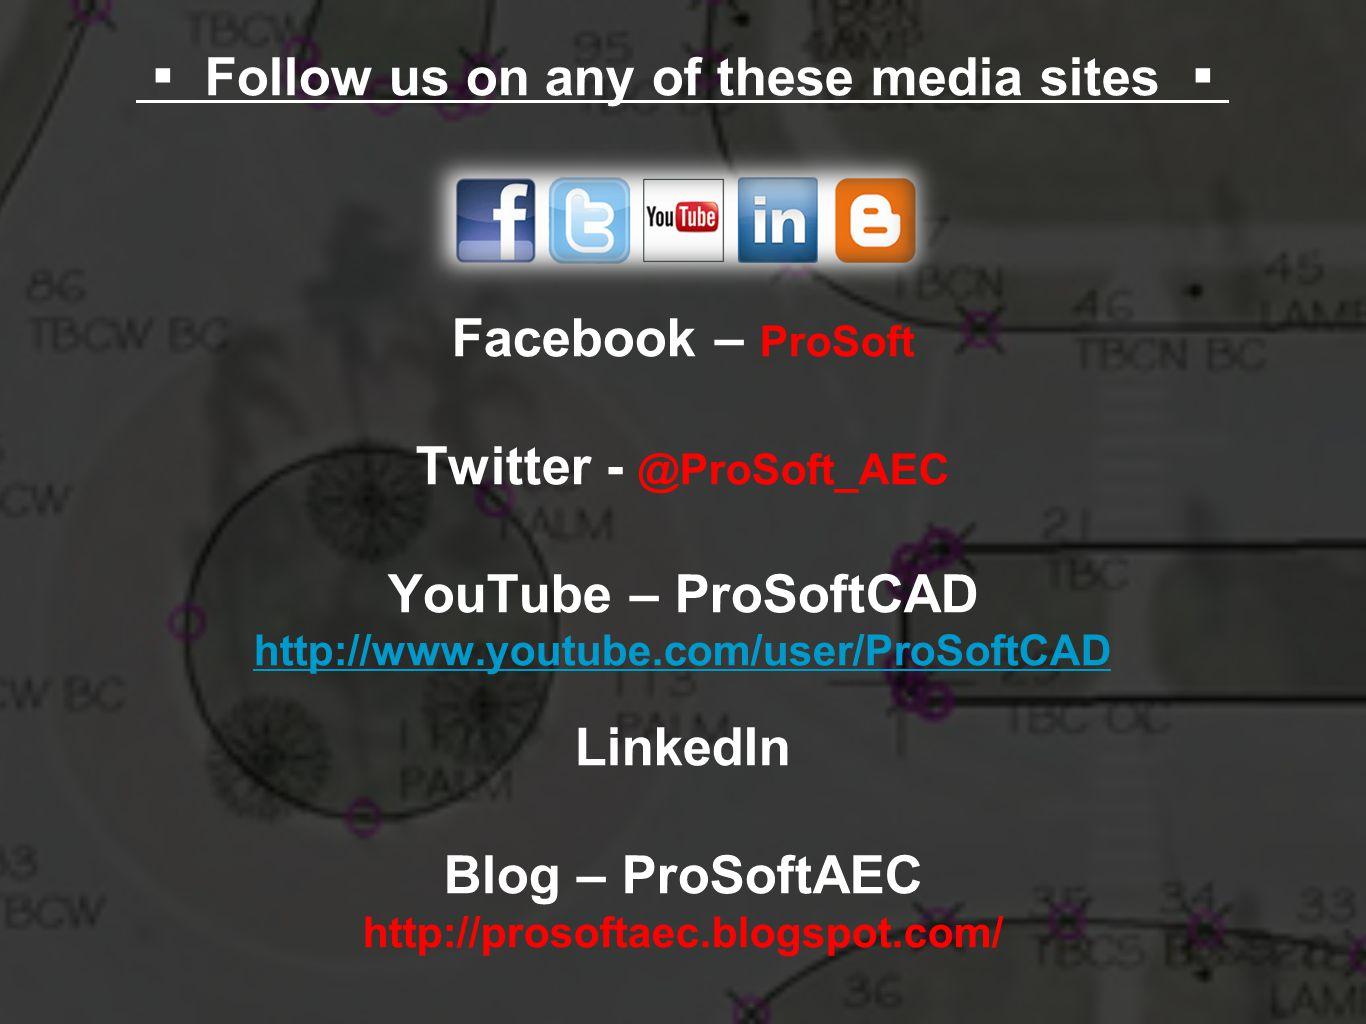 Follow us on any of these media sites Facebook – ProSoft Twitter - @ProSoft_AEC YouTube – ProSoftCAD http://www.youtube.com/user/ProSoftCAD LinkedIn Blog – ProSoftAEC http://prosoftaec.blogspot.com/ http://www.youtube.com/user/ProSoftCAD